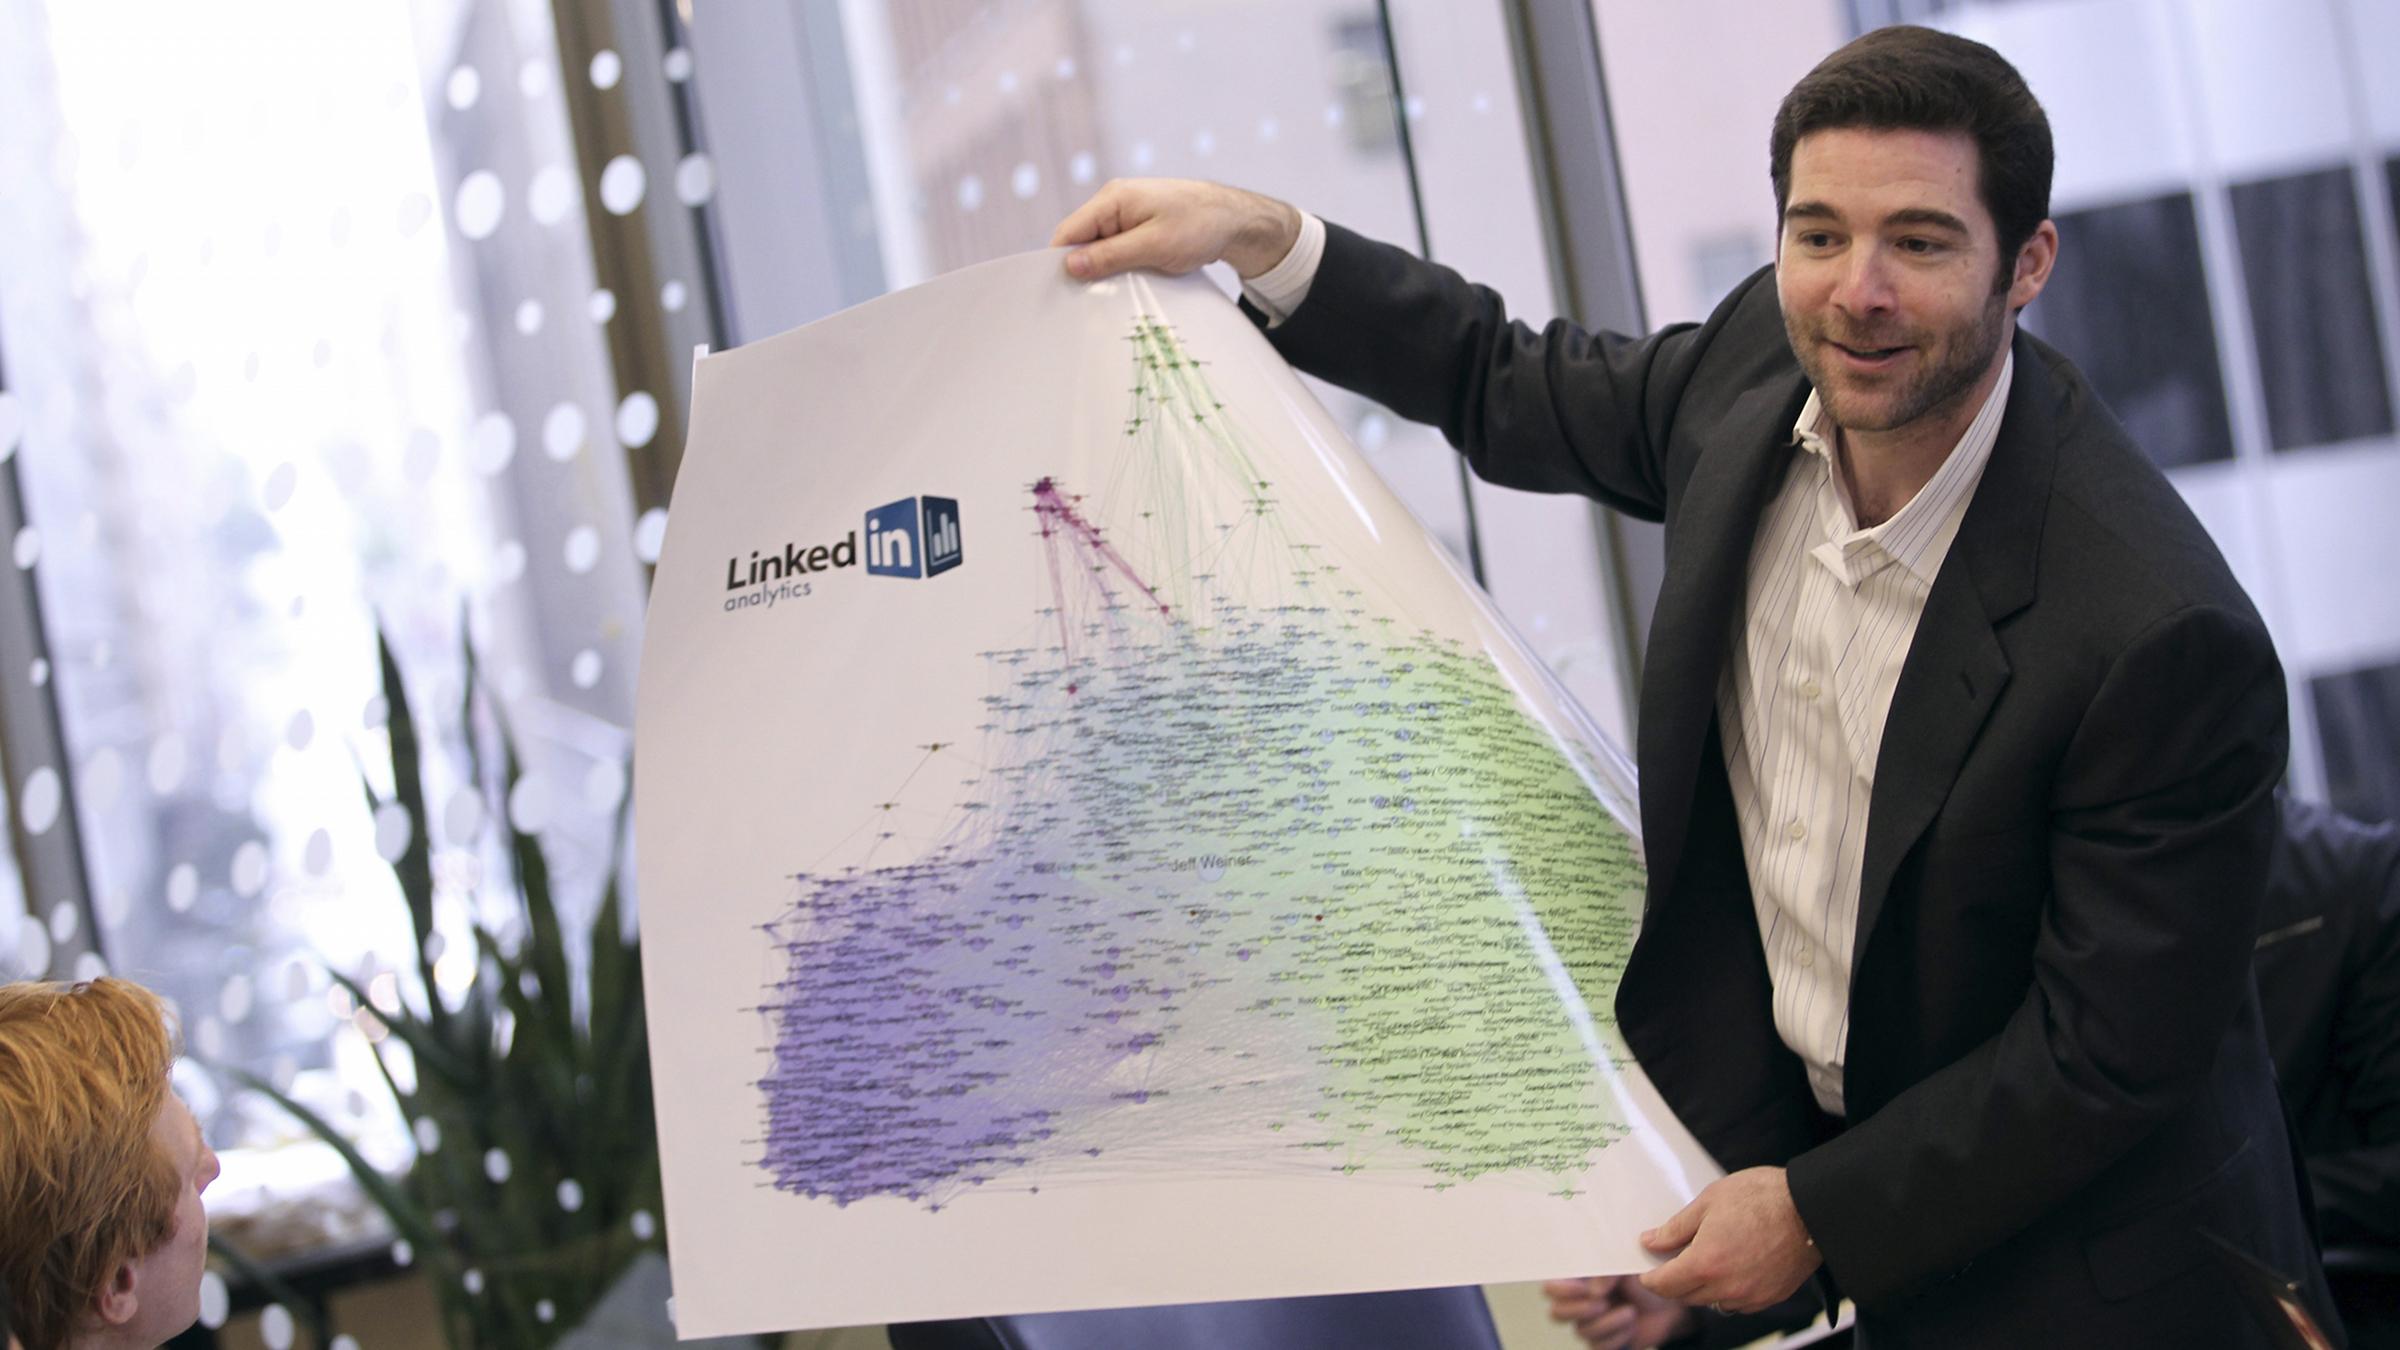 LinkedIn social graph